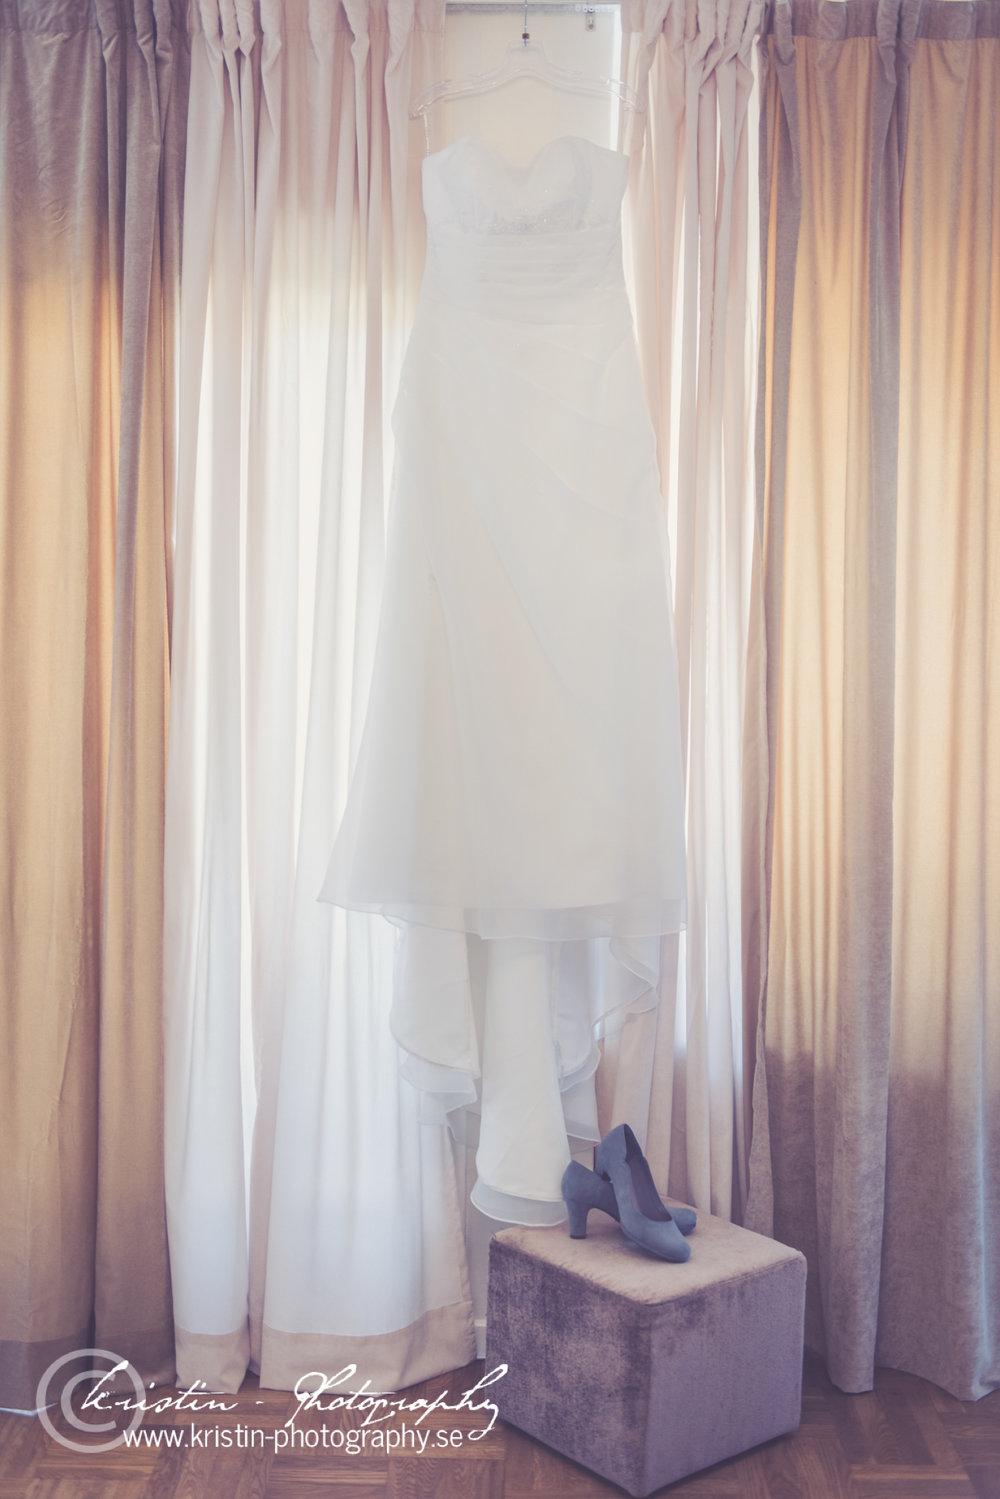 Bröllopsfotograf i Stockholm, Kristin - Photography , Munchen Bryggeriet-3.jpg